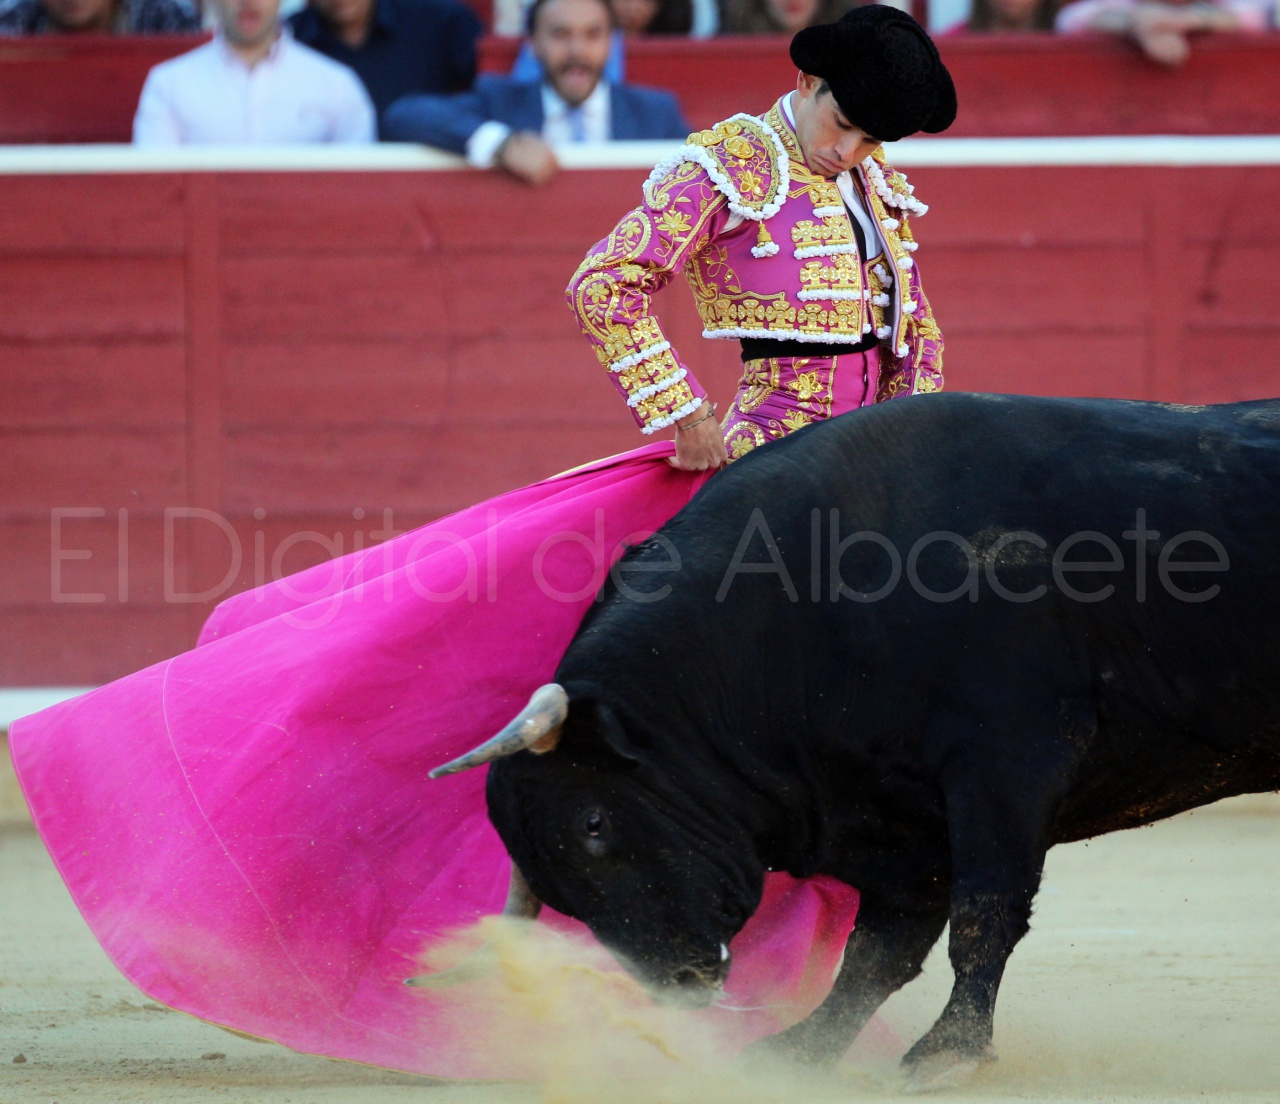 El Juli Lopez Simon y Garrido Feria Albacete 2015 toros  62